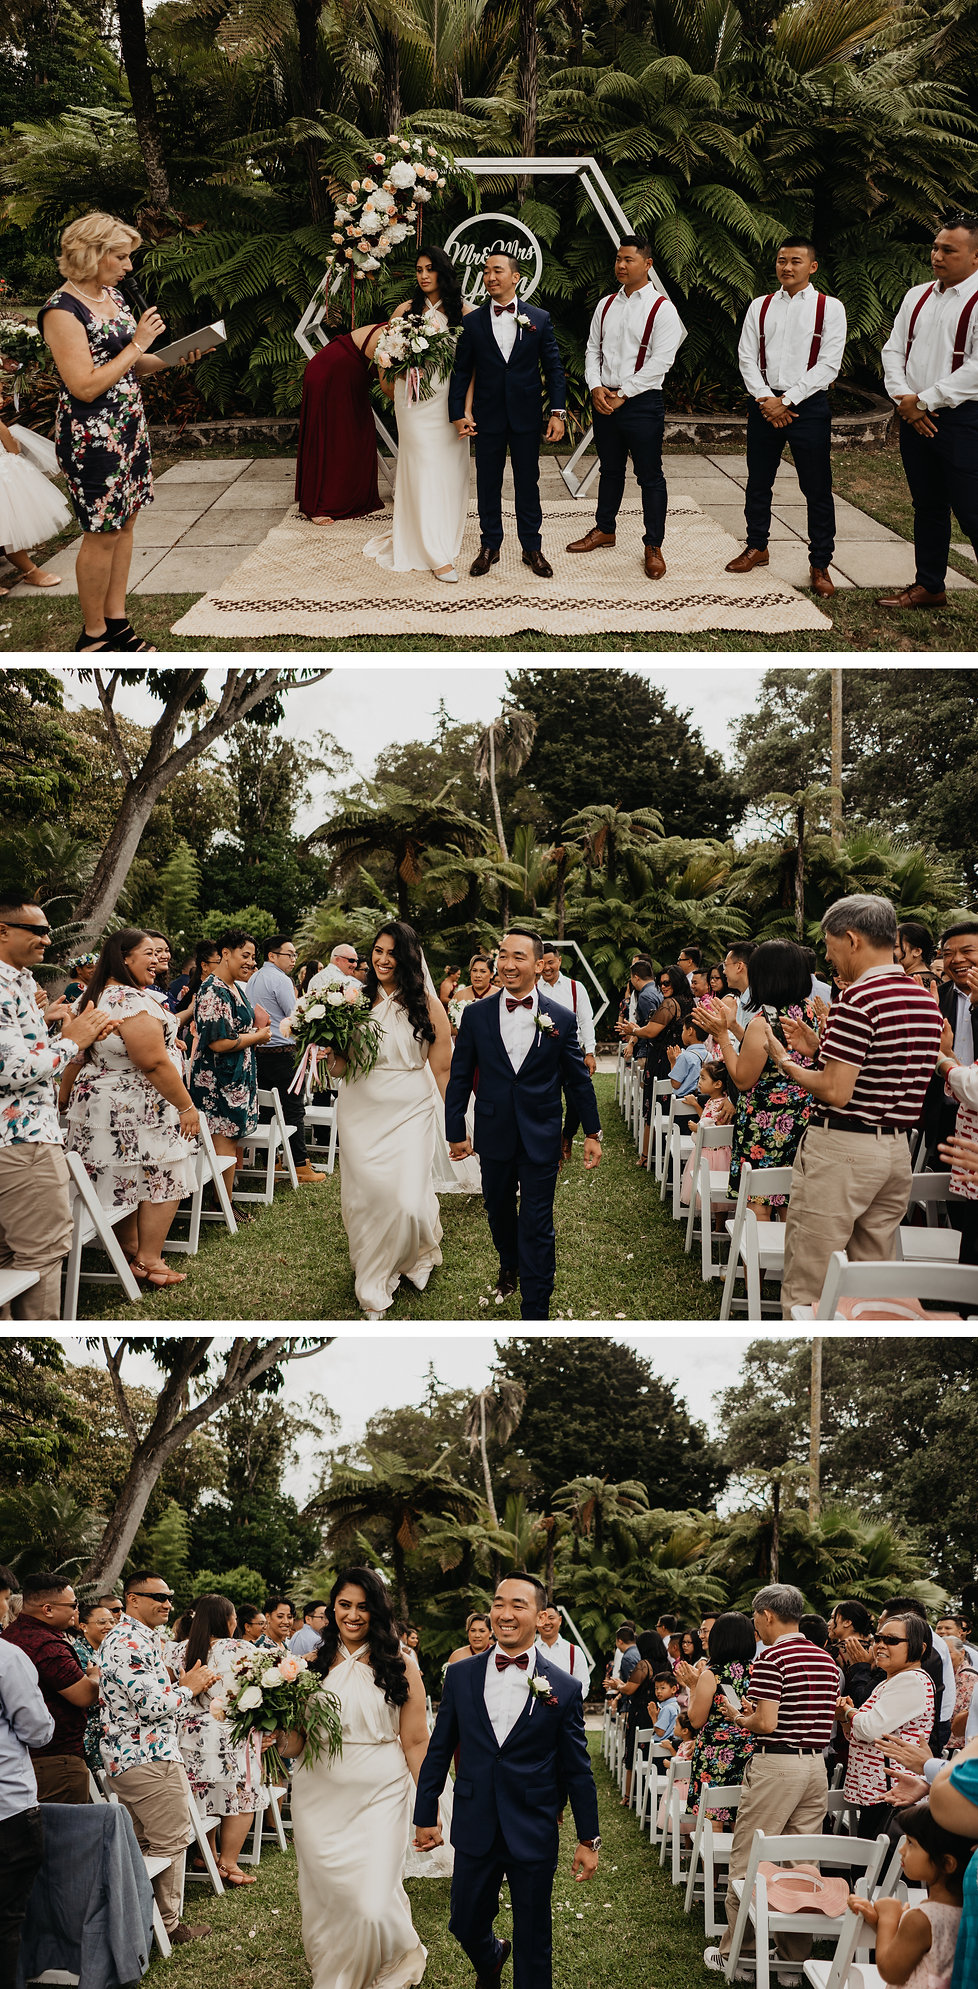 Vintage wedding at The Kelliher Estate in Auckland, New Zealand captured by wanderlusting lovers